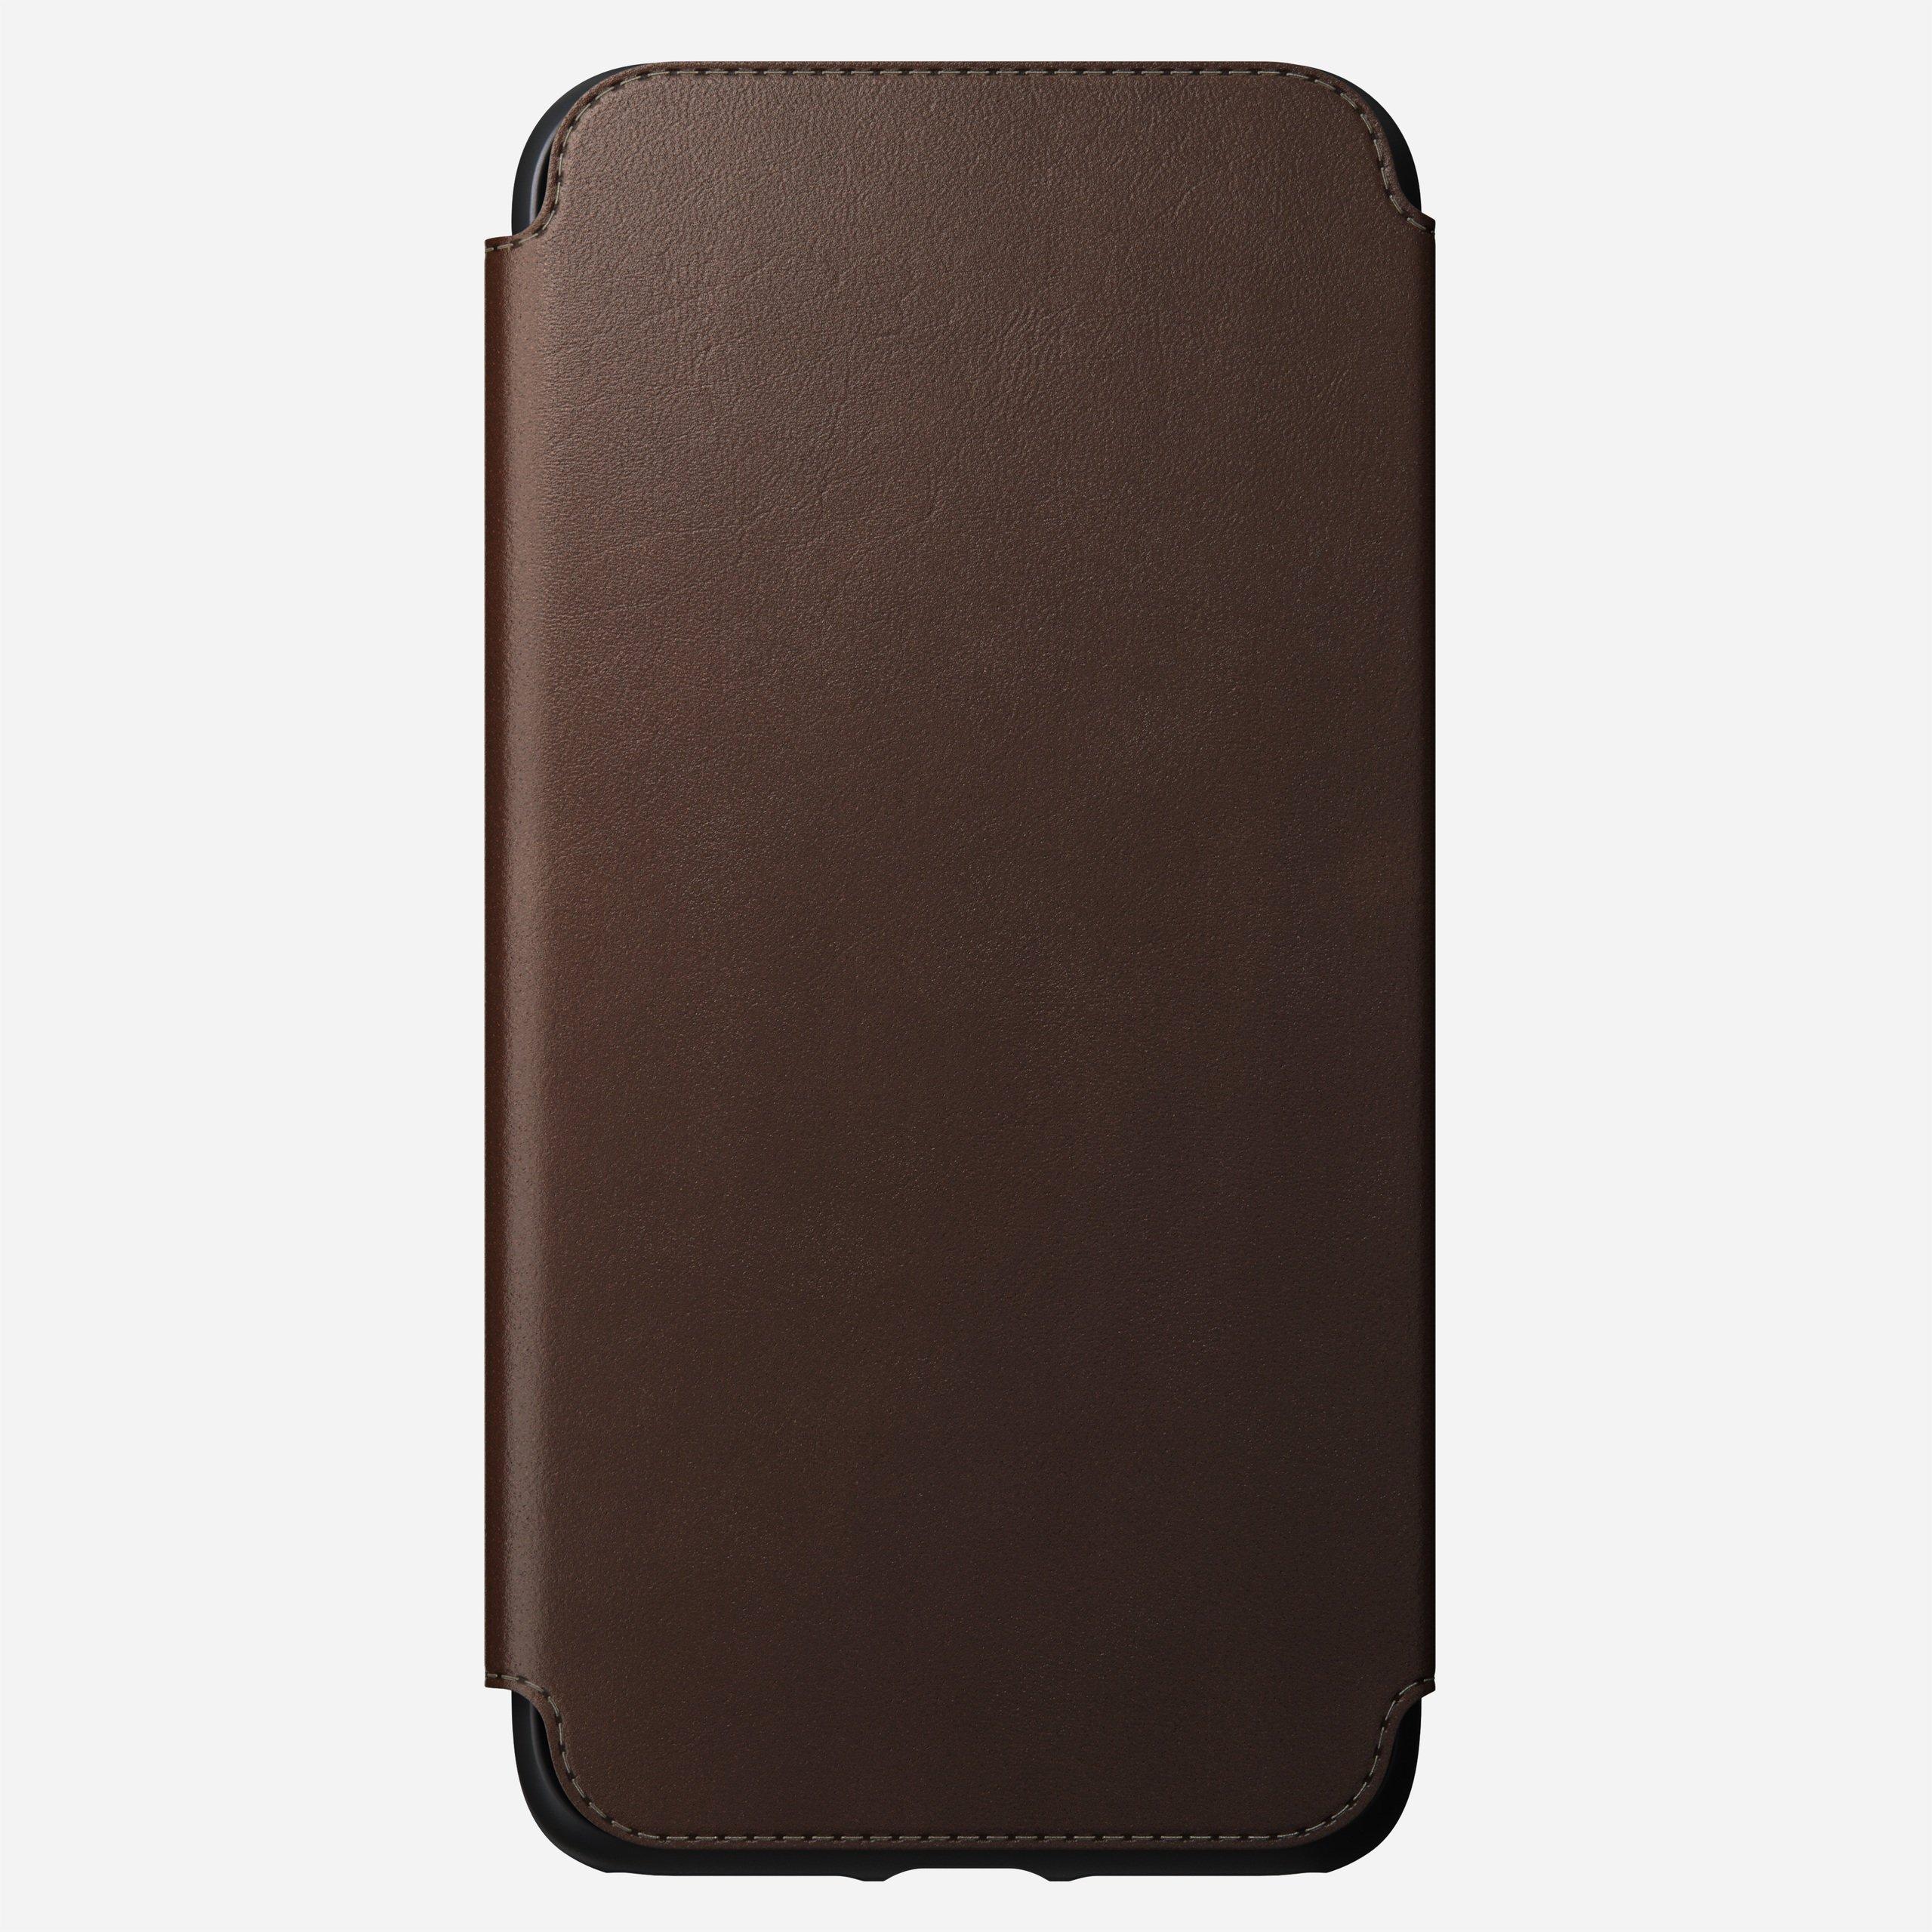 Rugged tri folio rustic brown iphone 11 pro max